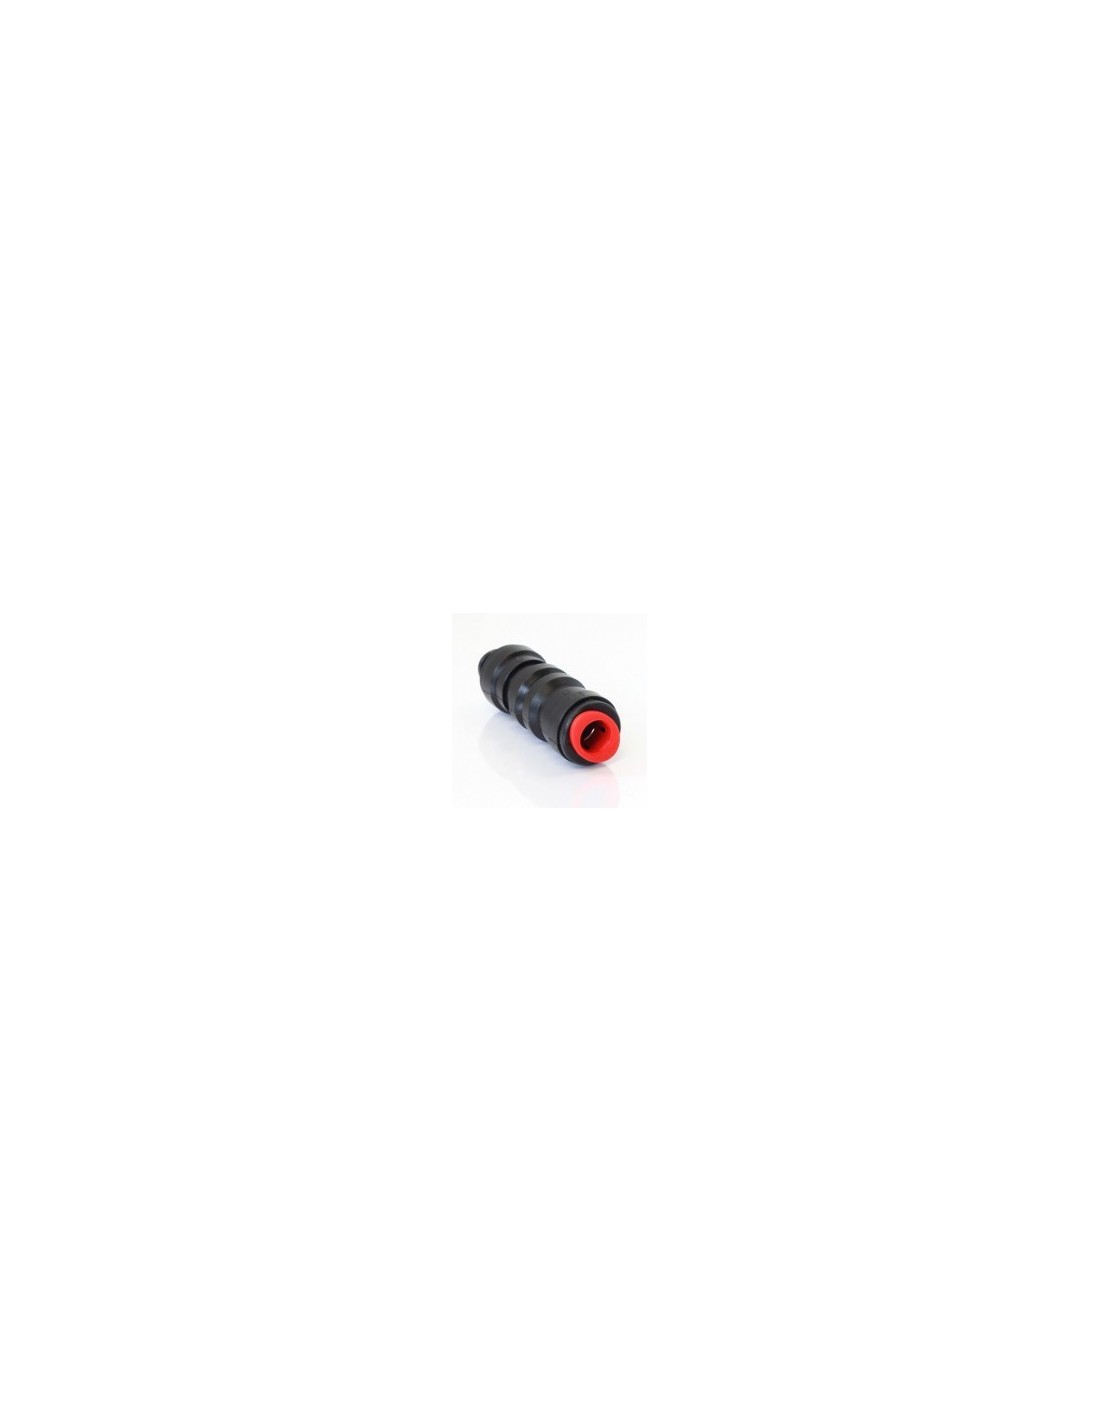 SPO02055 - JG Backventil 8x8 mm